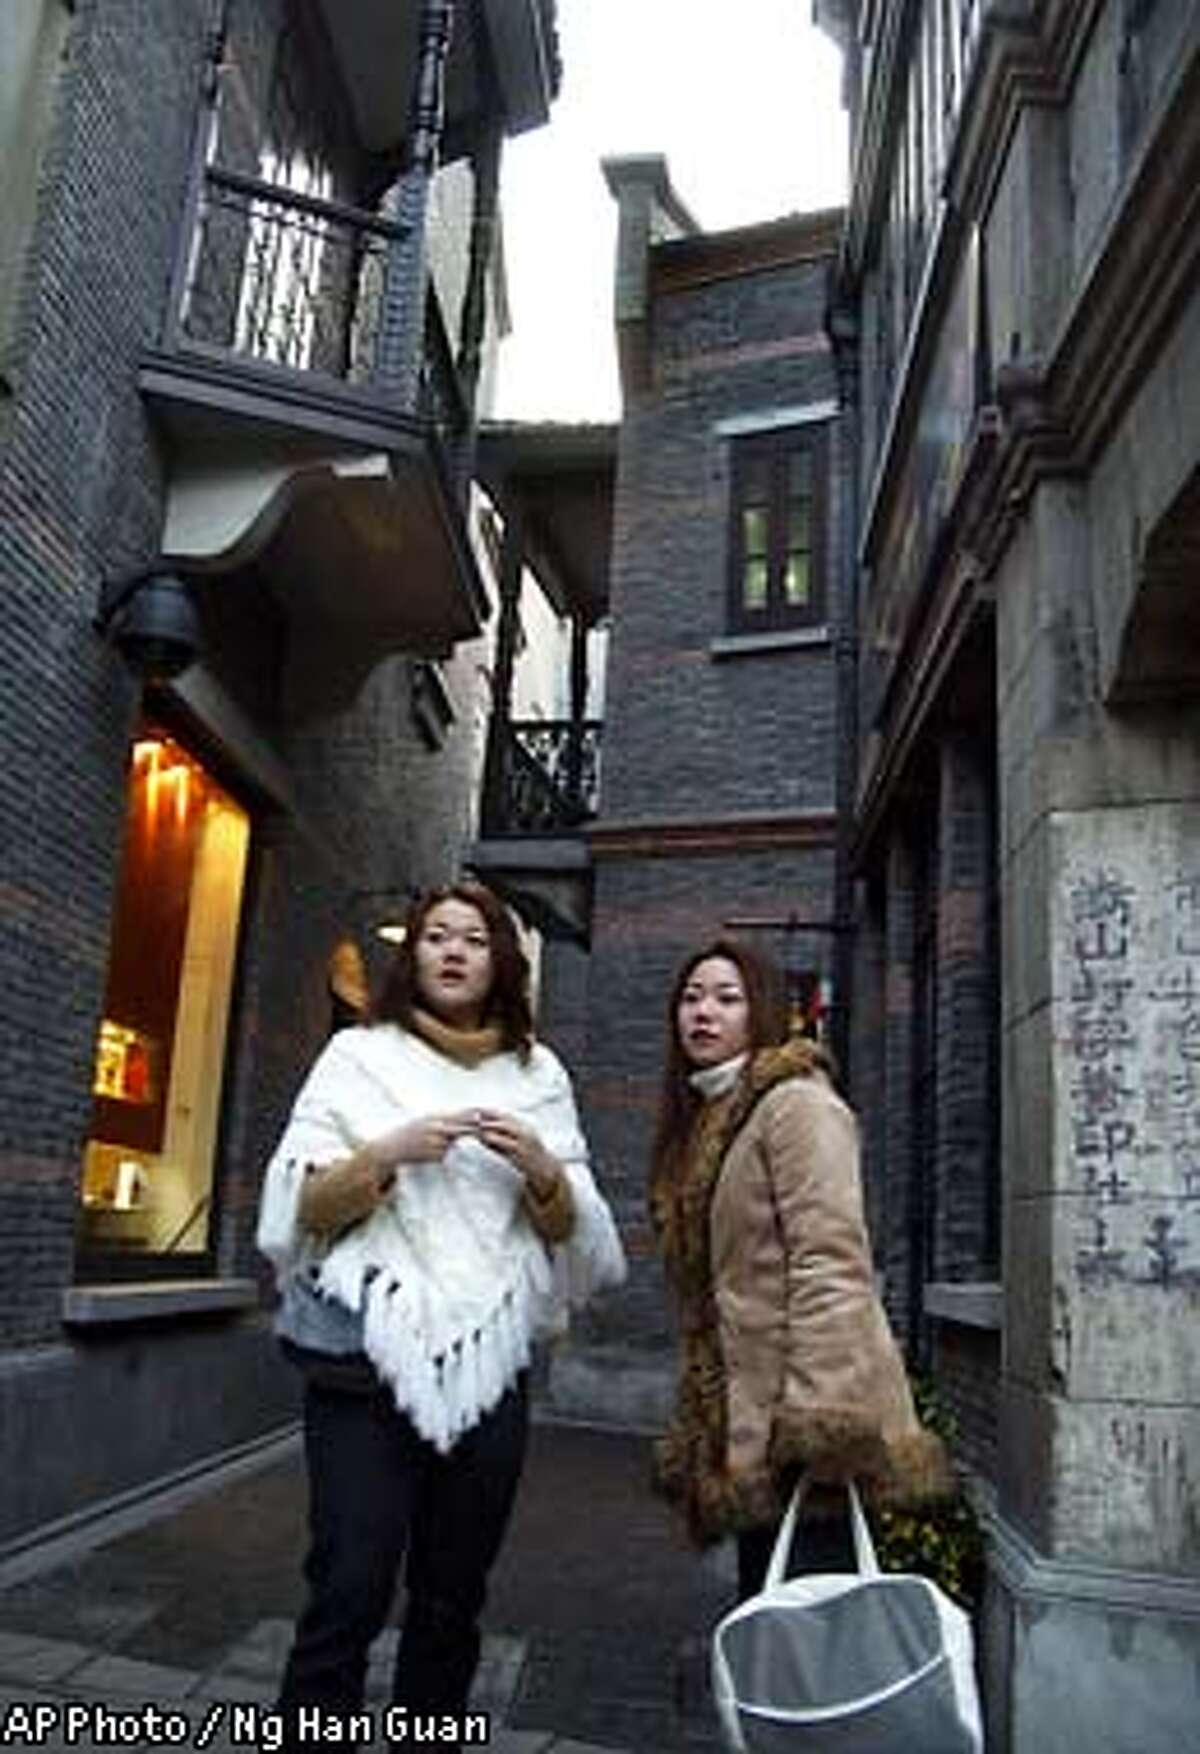 SPECIAL FOR THE SAN FRANCISCO CHRONICLE--Tourists at Xintiandi in Shanghai, Friday, Jan. 24, 2003. (AP Photo / Ng Han Guan)